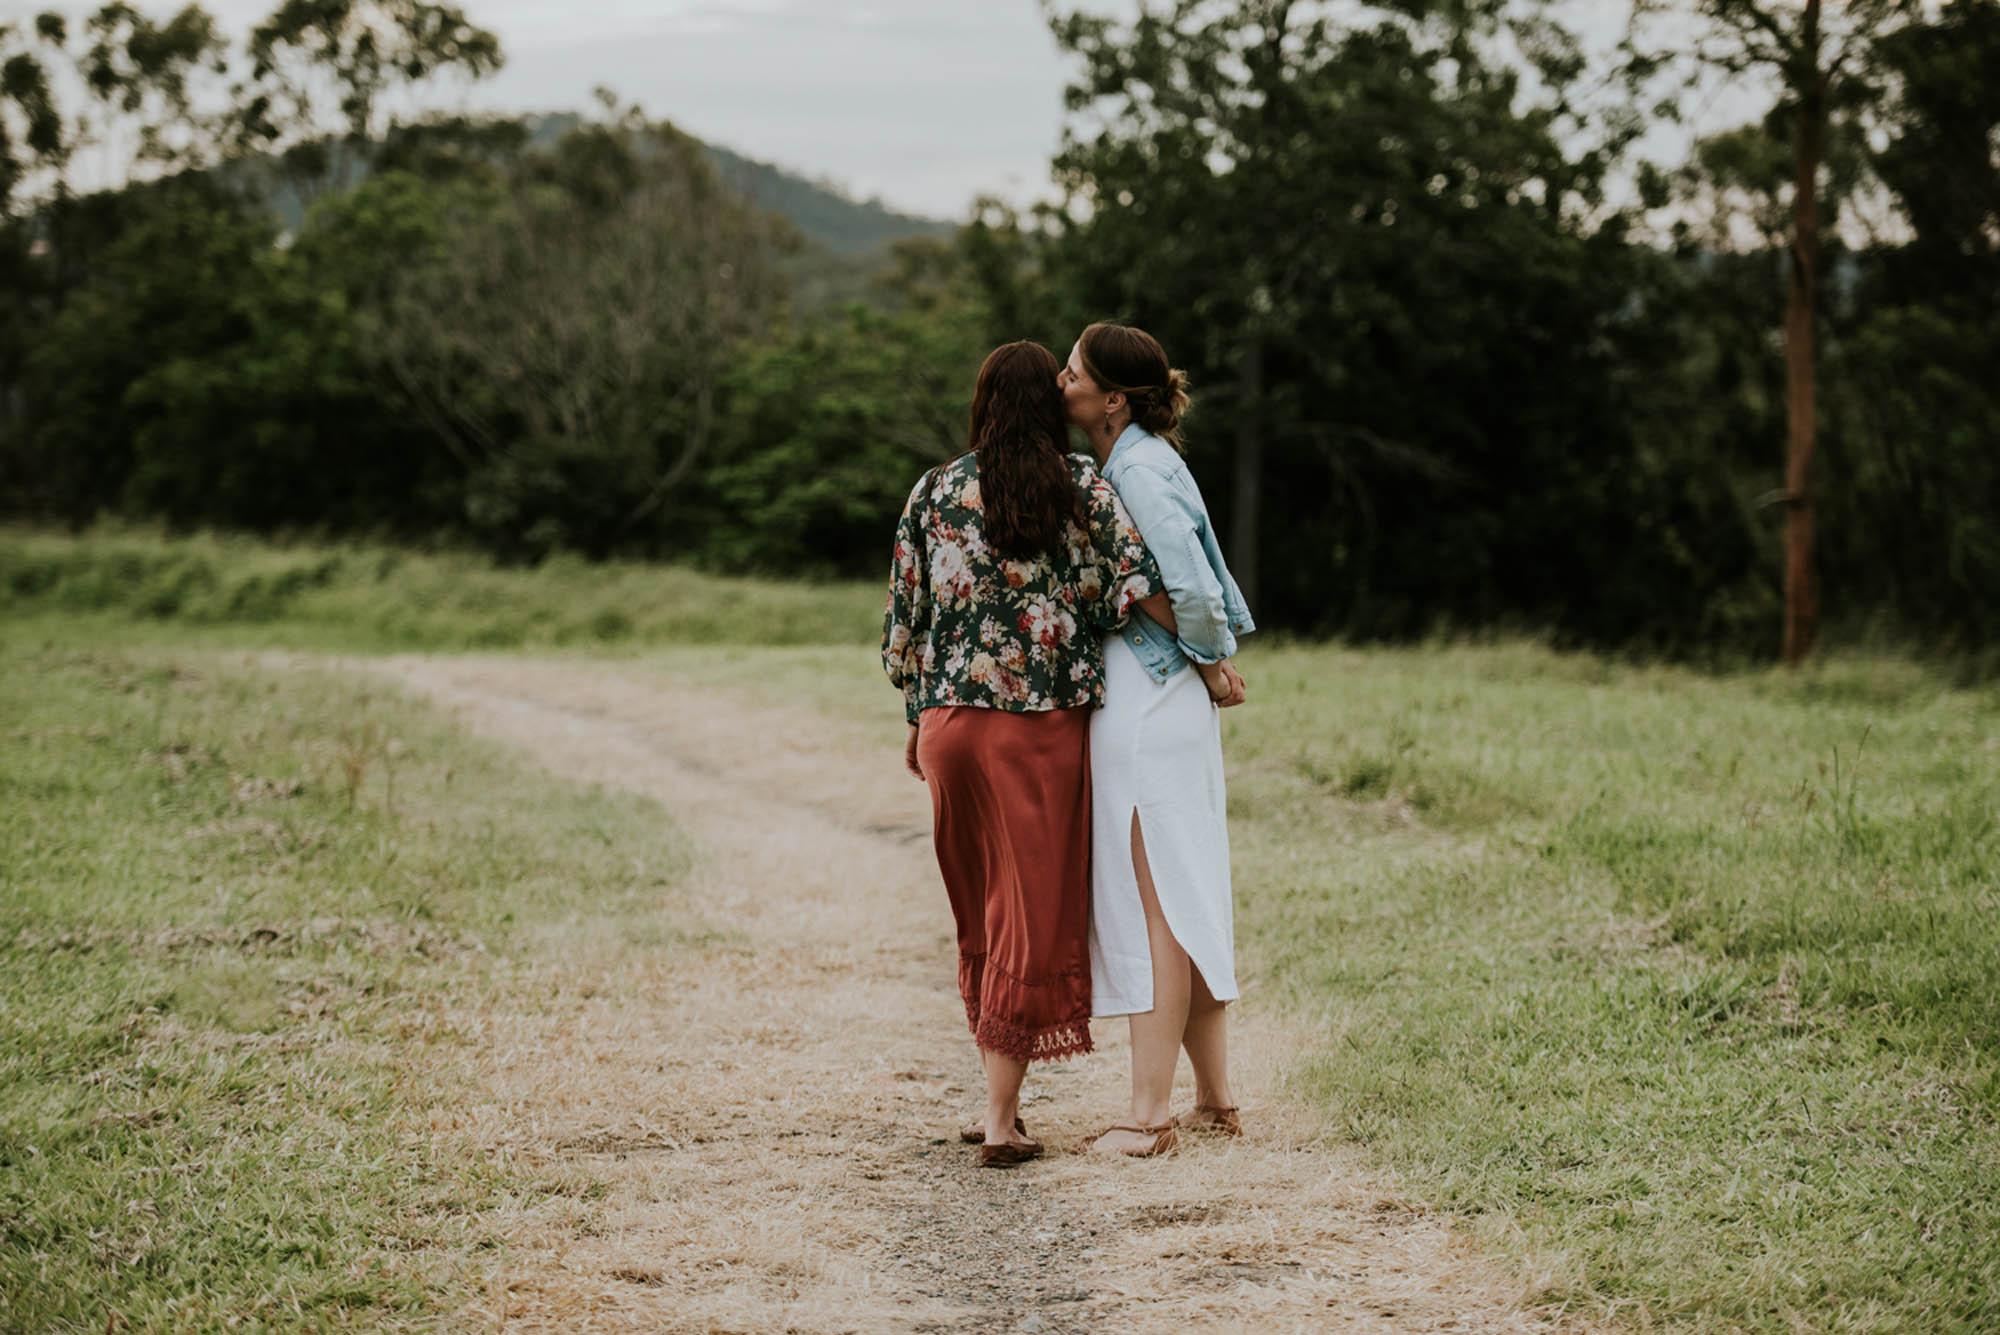 Lesbian IVF Journey - Brisbane Same-Sex Wedding Photographer - Dancing With Her